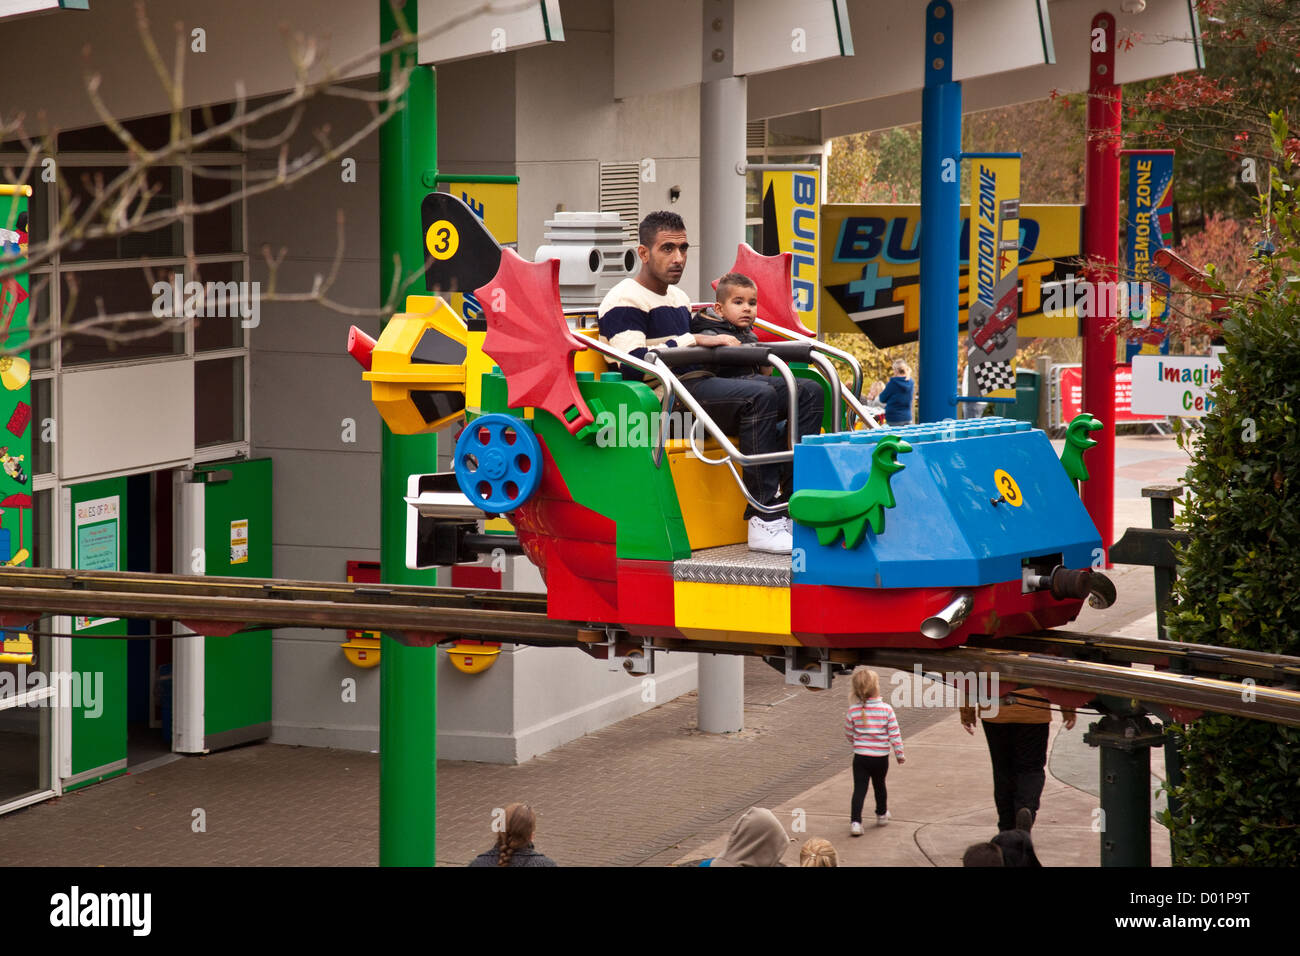 Sky Rider ride at Legoland theme park, Winsor, England, United Kingdom. Stock Photo